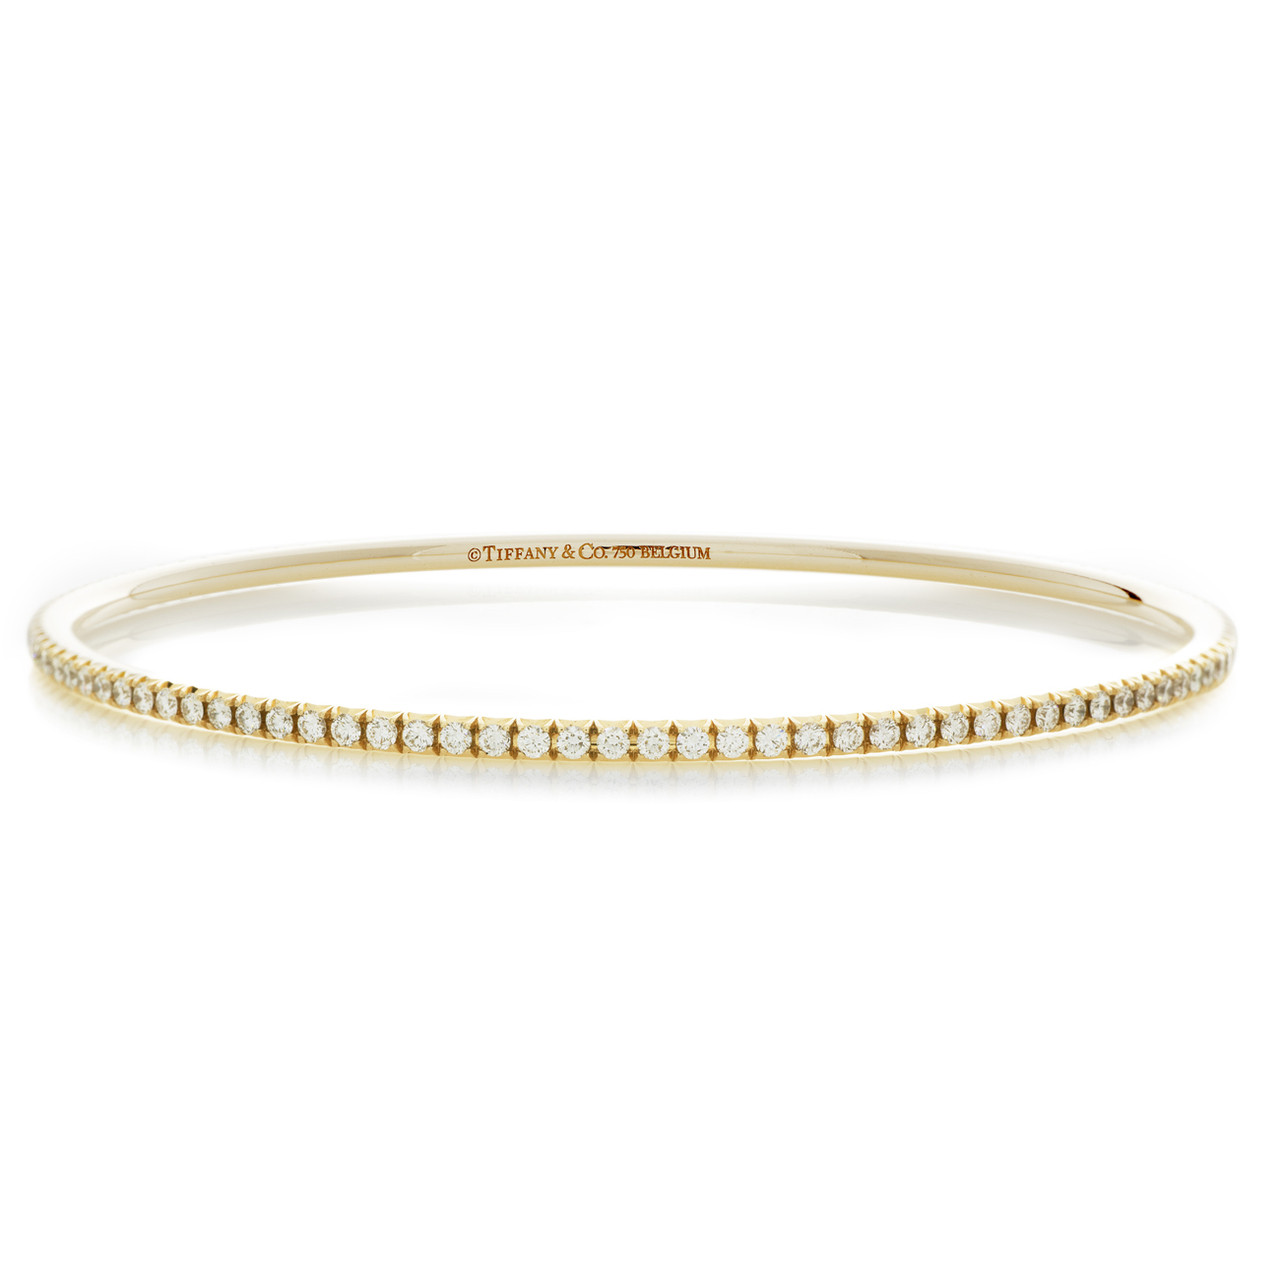 2de55058c Tiffany & Co. 18K Yellow Gold & Diamond Metro Bangle - modaselle